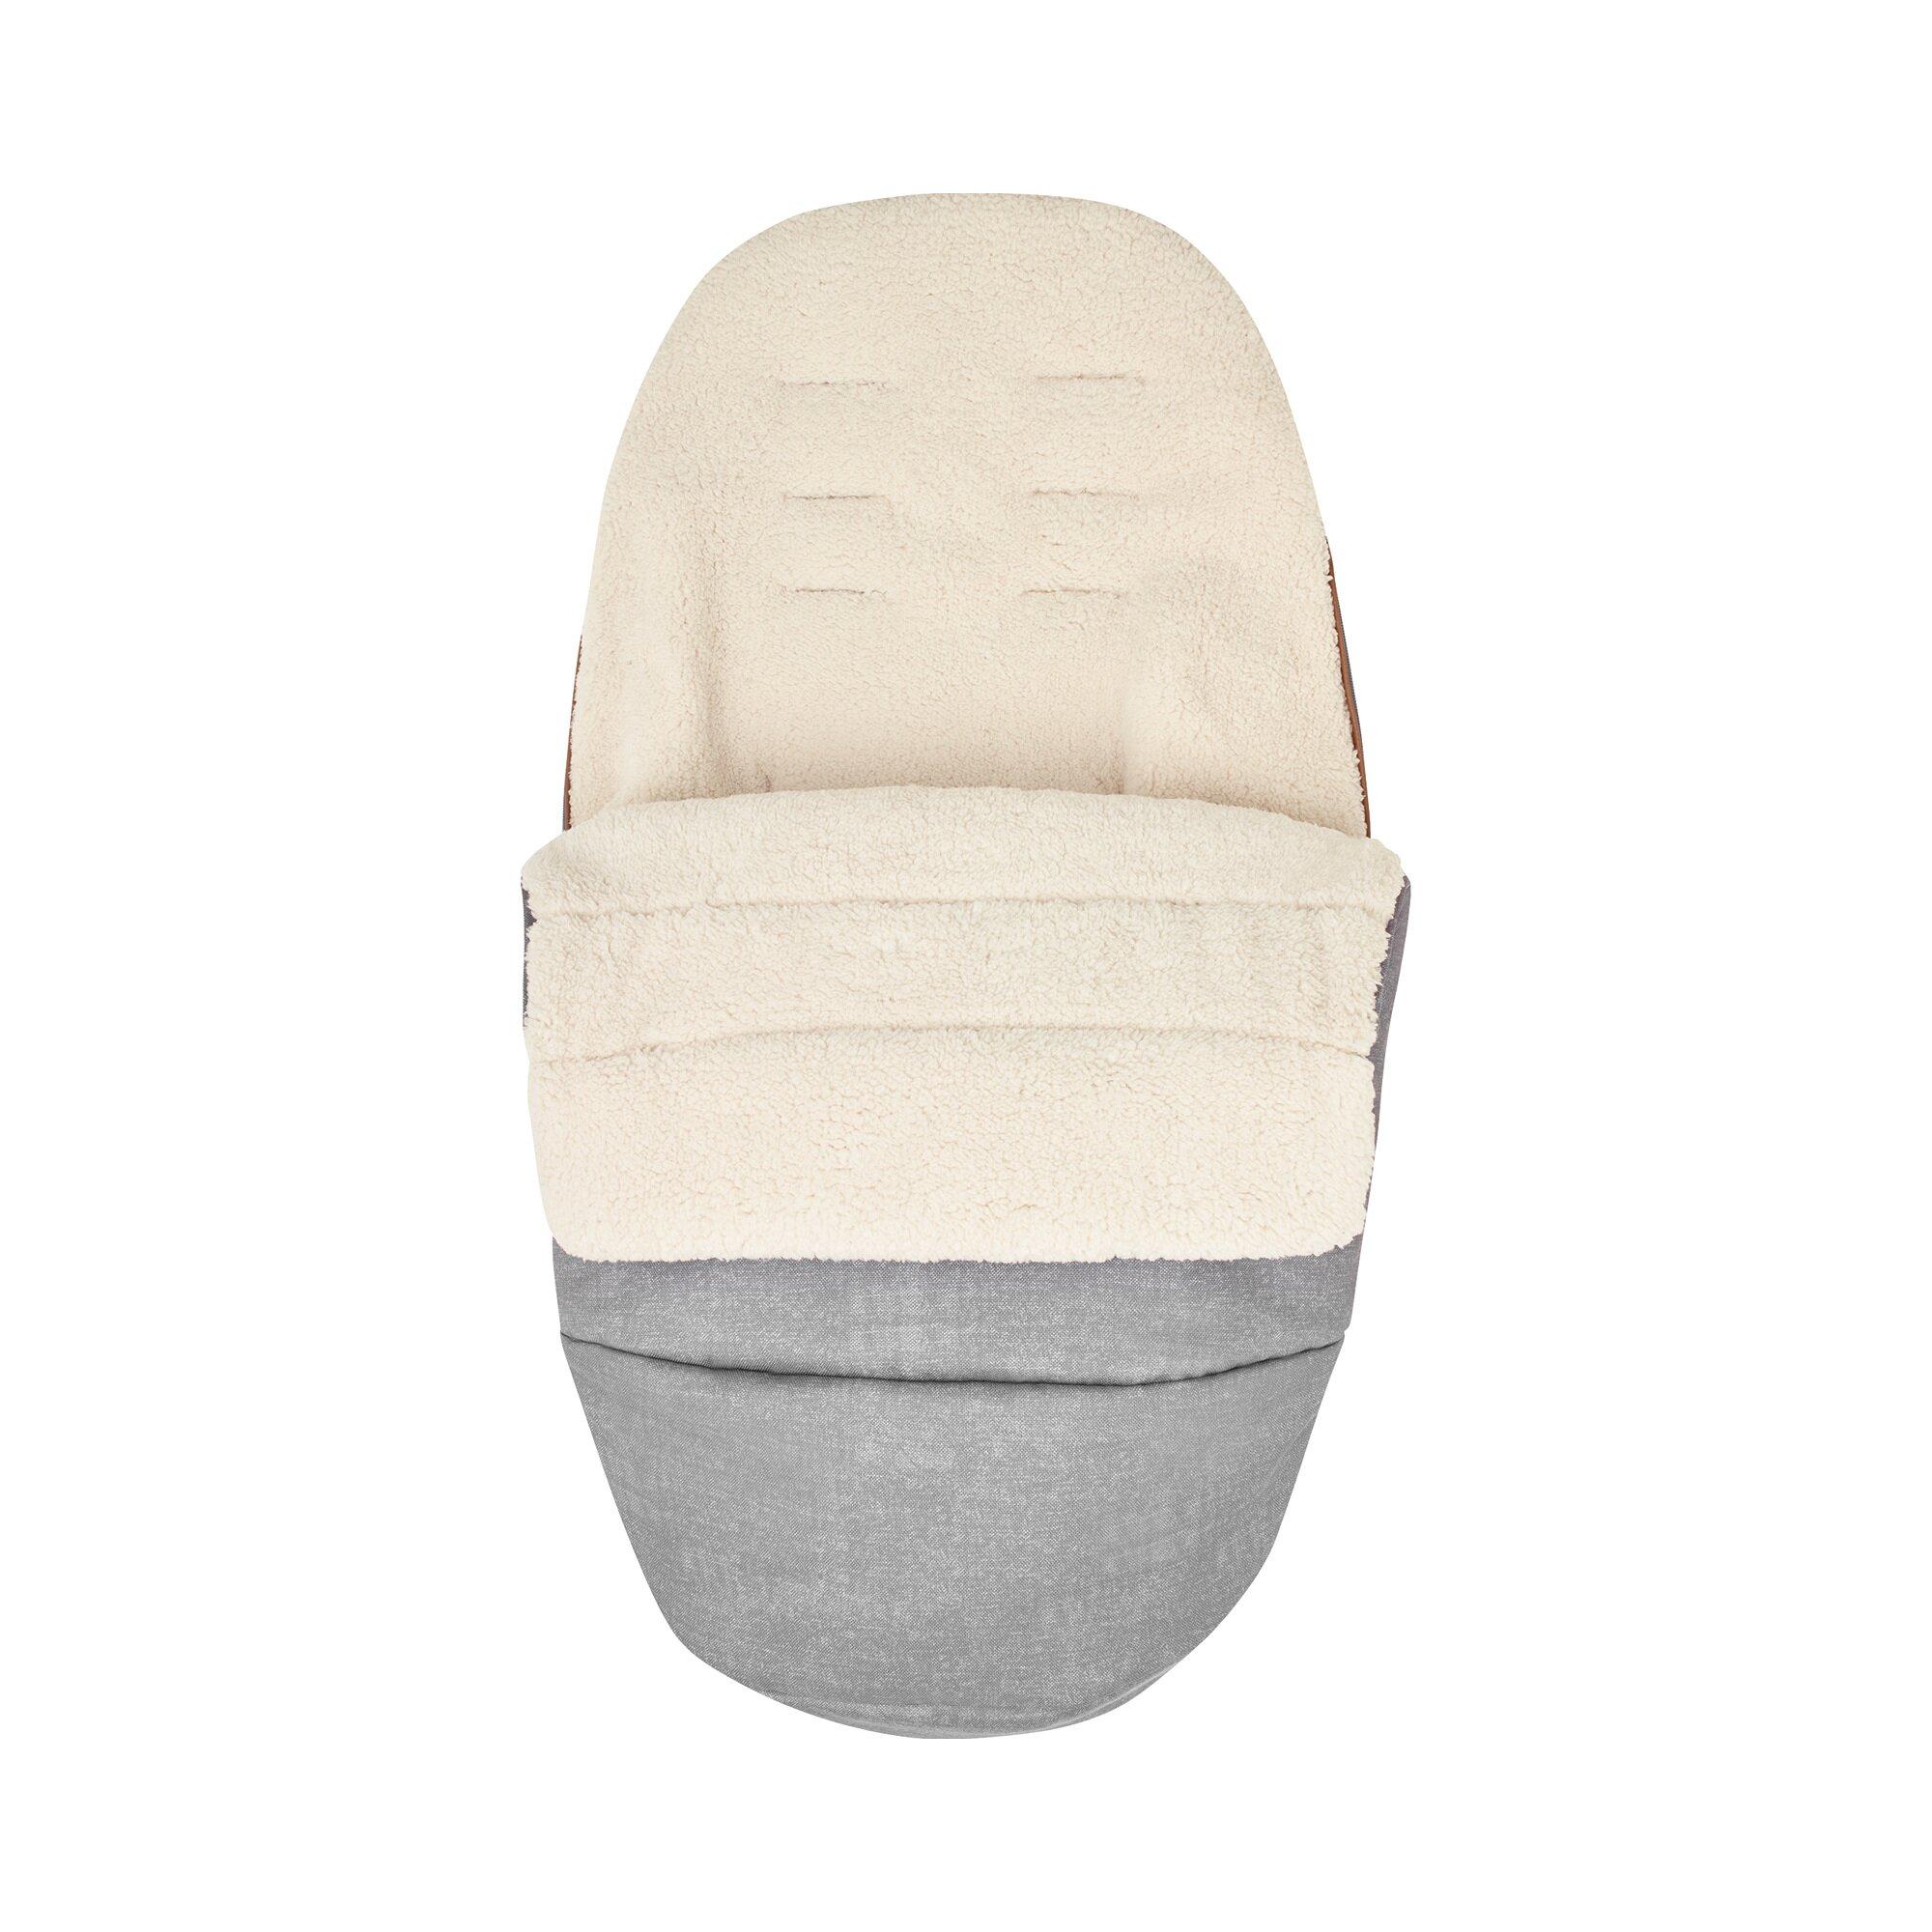 maxi-cosi-winter-fu-sack-fur-adorra-dana-laika-nova-stella-design-2018-grau